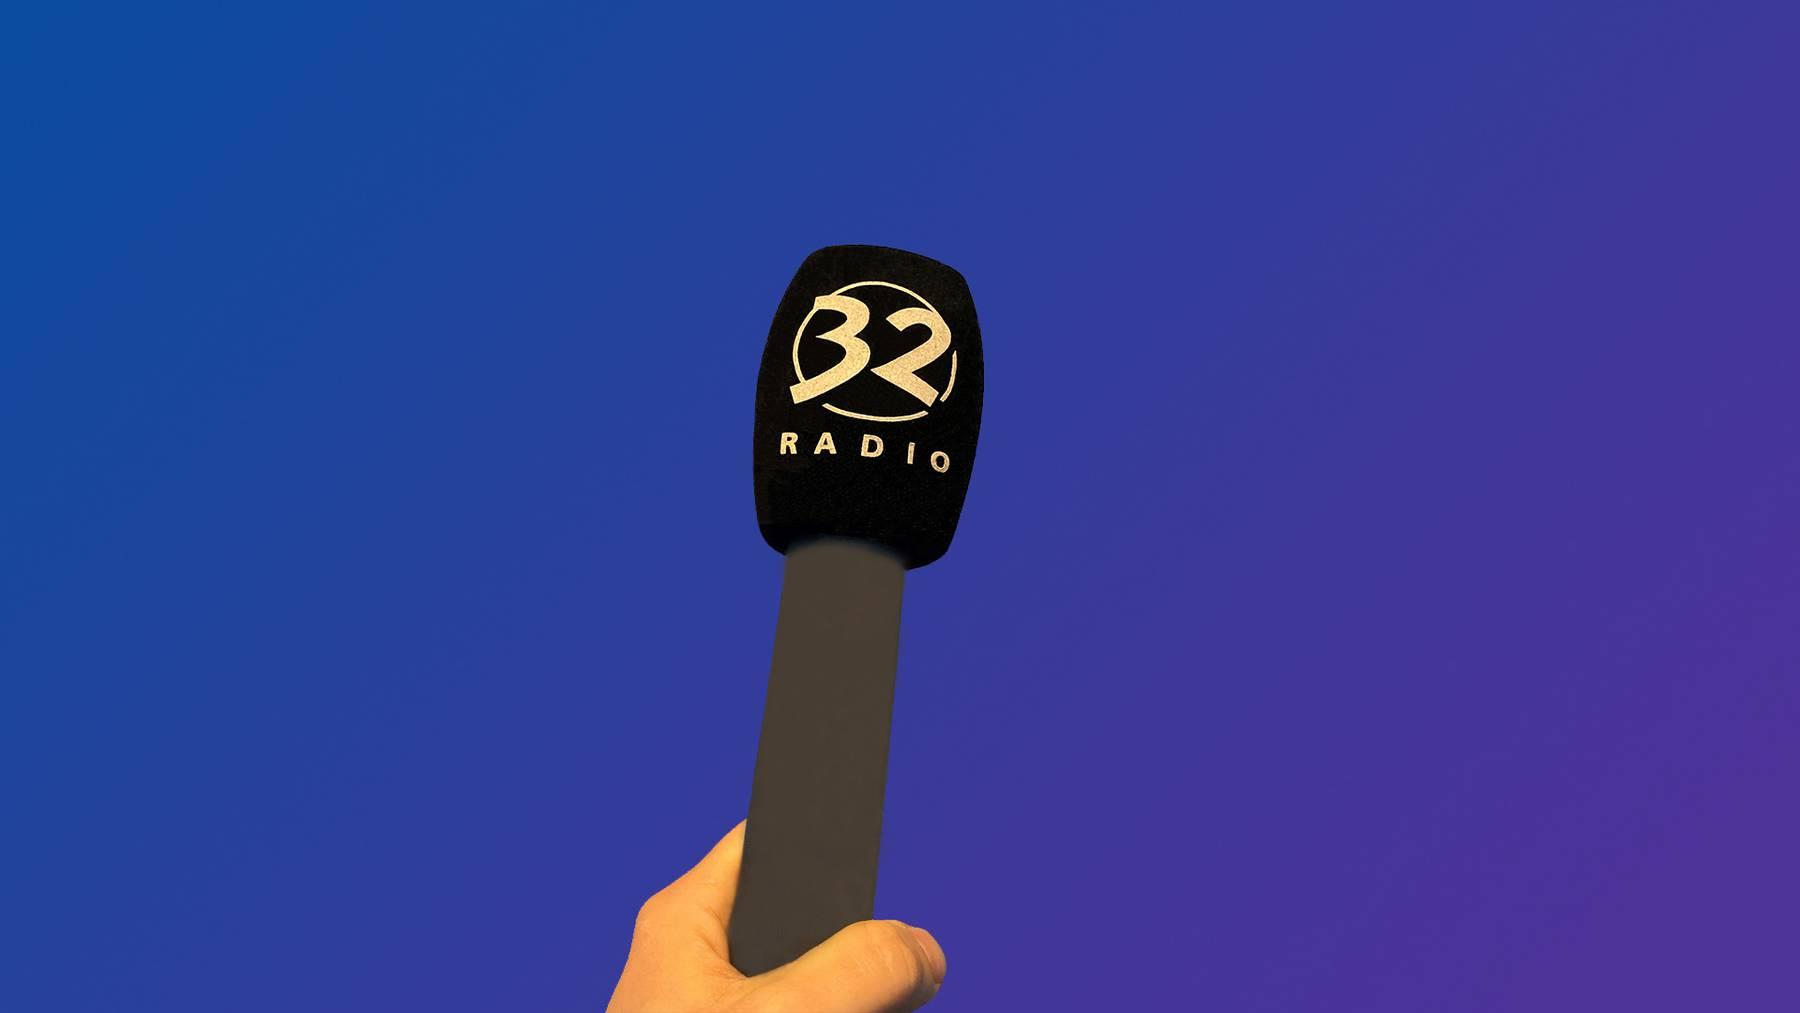 Radio 32 Jahresrückblick Grafik